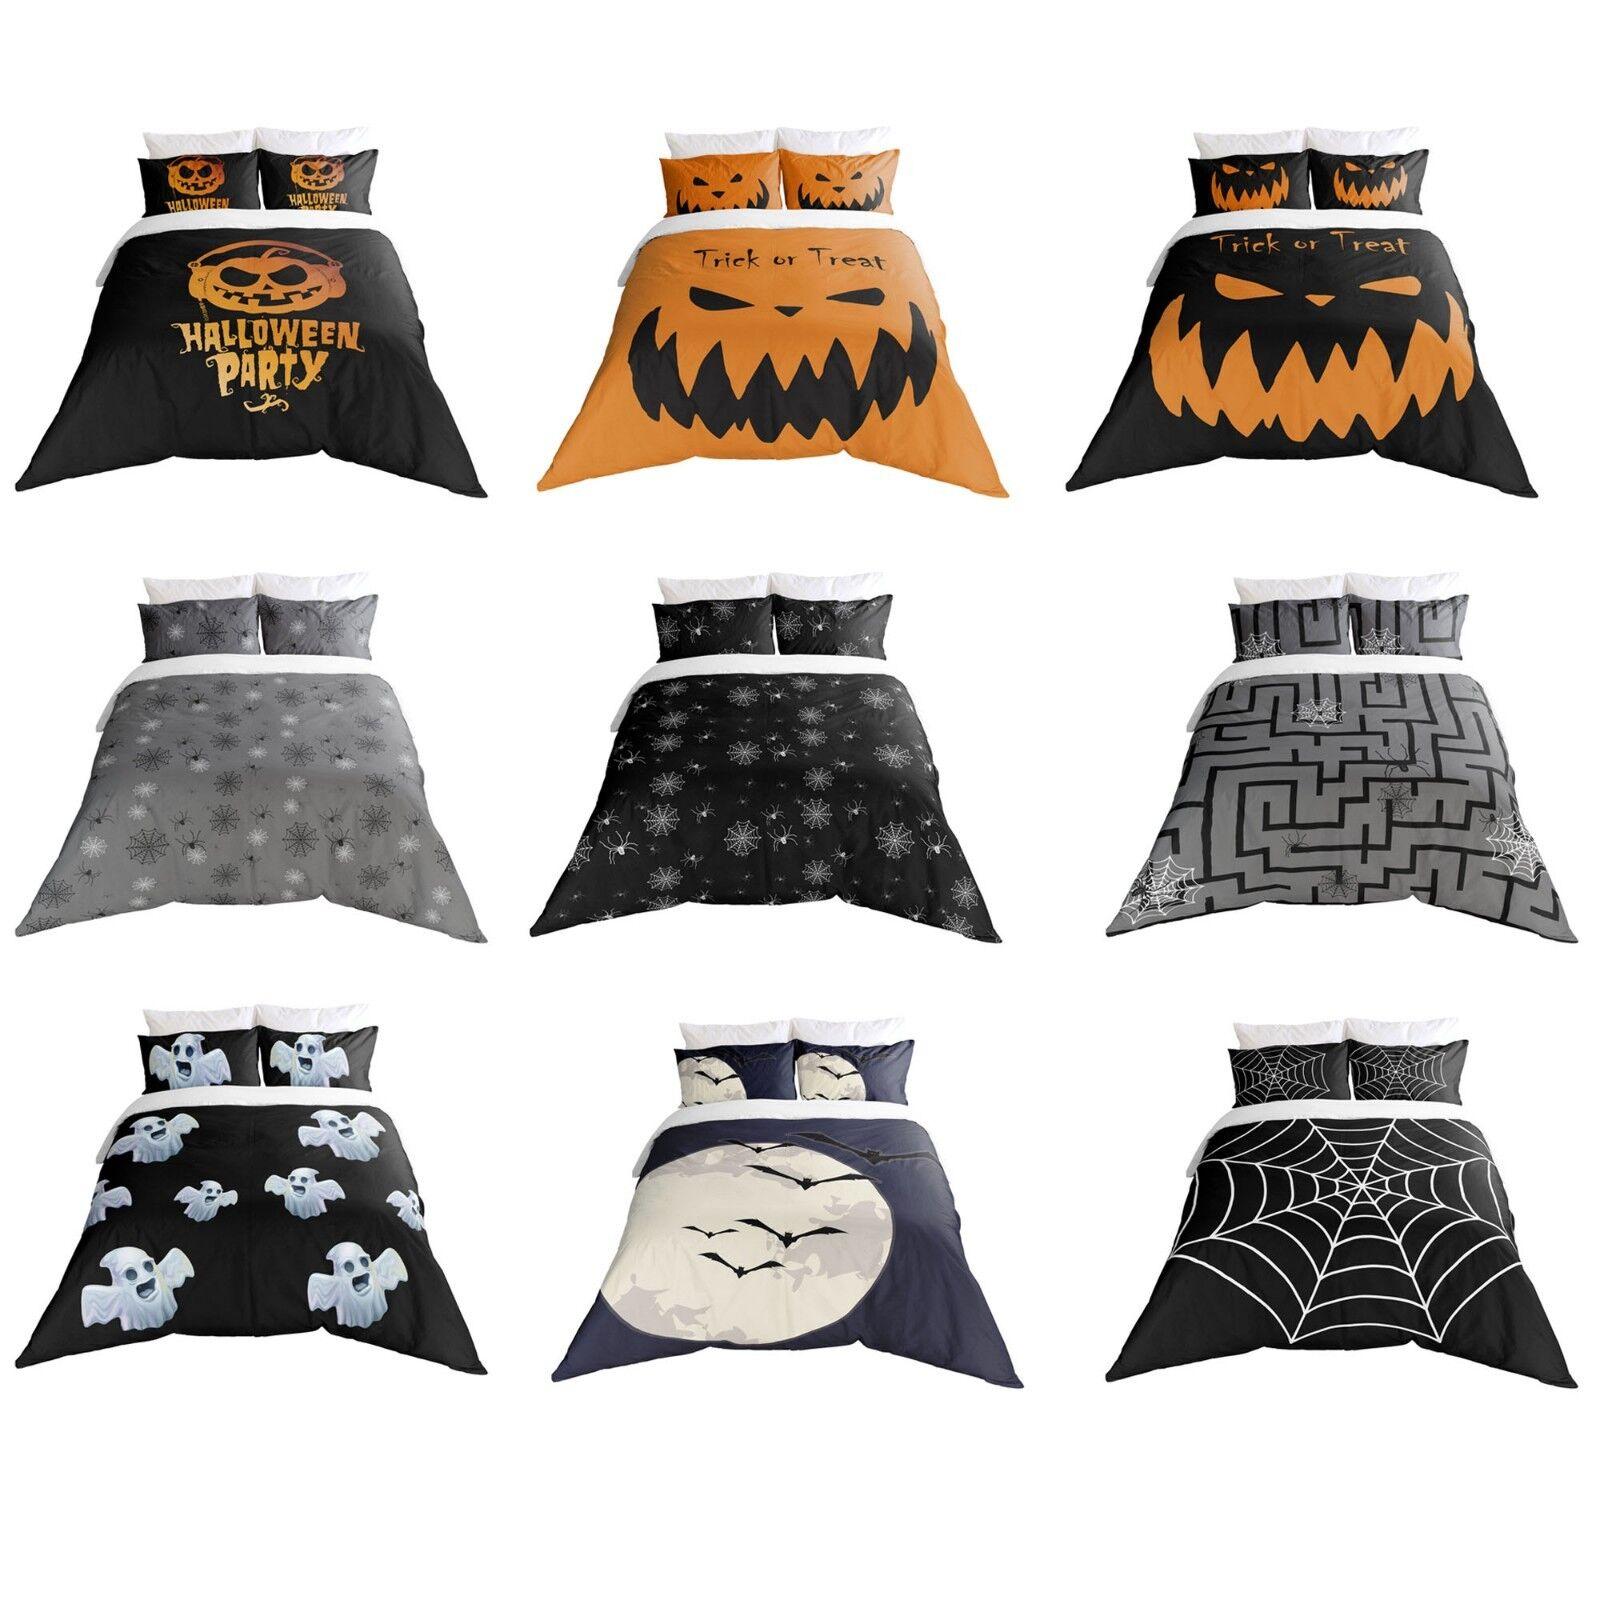 Adam Home 3D Digital Print Halloween Design Duvet Cover With Pillowcases Set